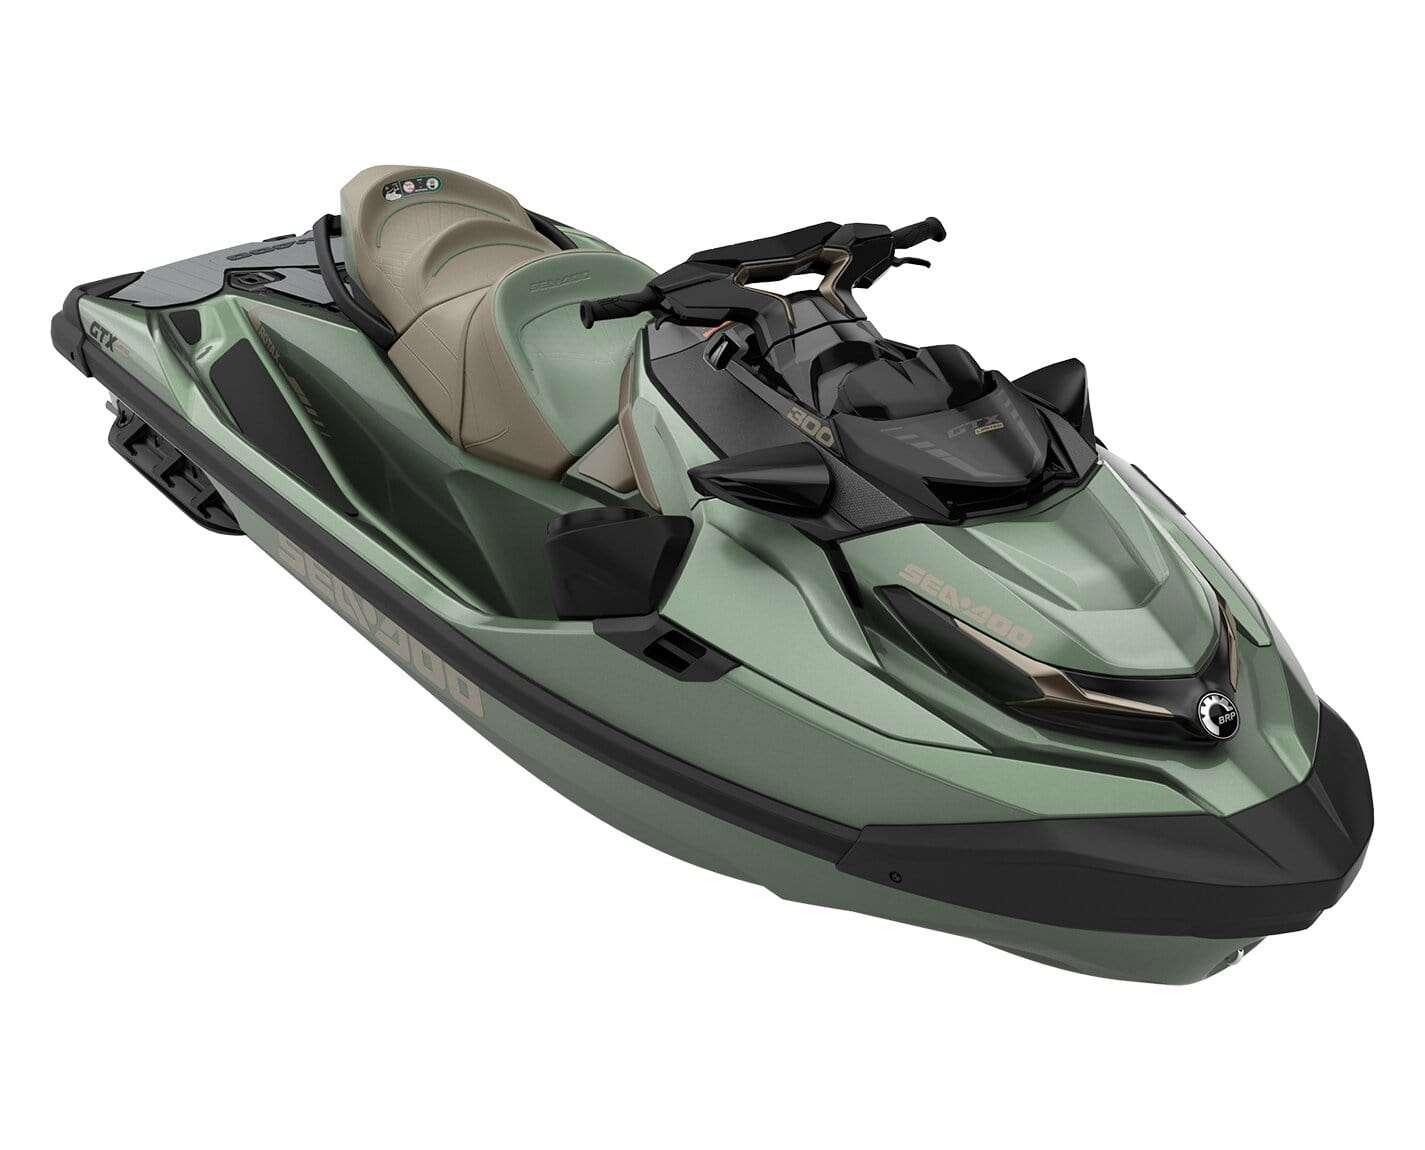 Comprar moto de agua Sea-Doo GTX Limited 300 en Barcelona